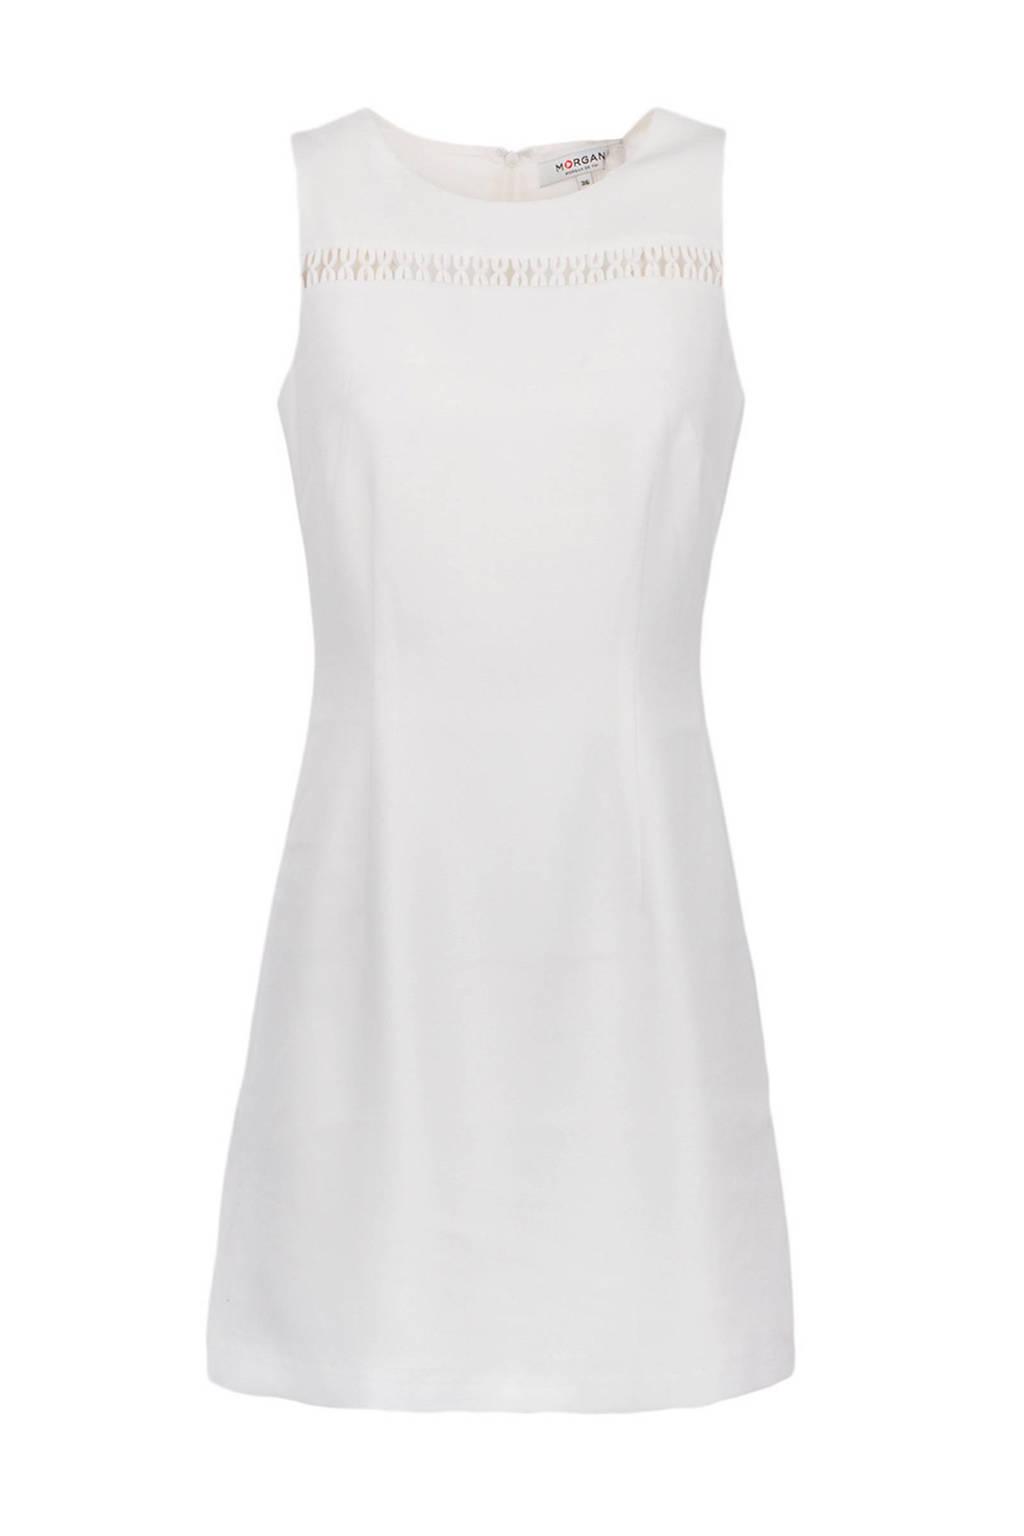 Morgan A-lijn jurk, Gebroken wit